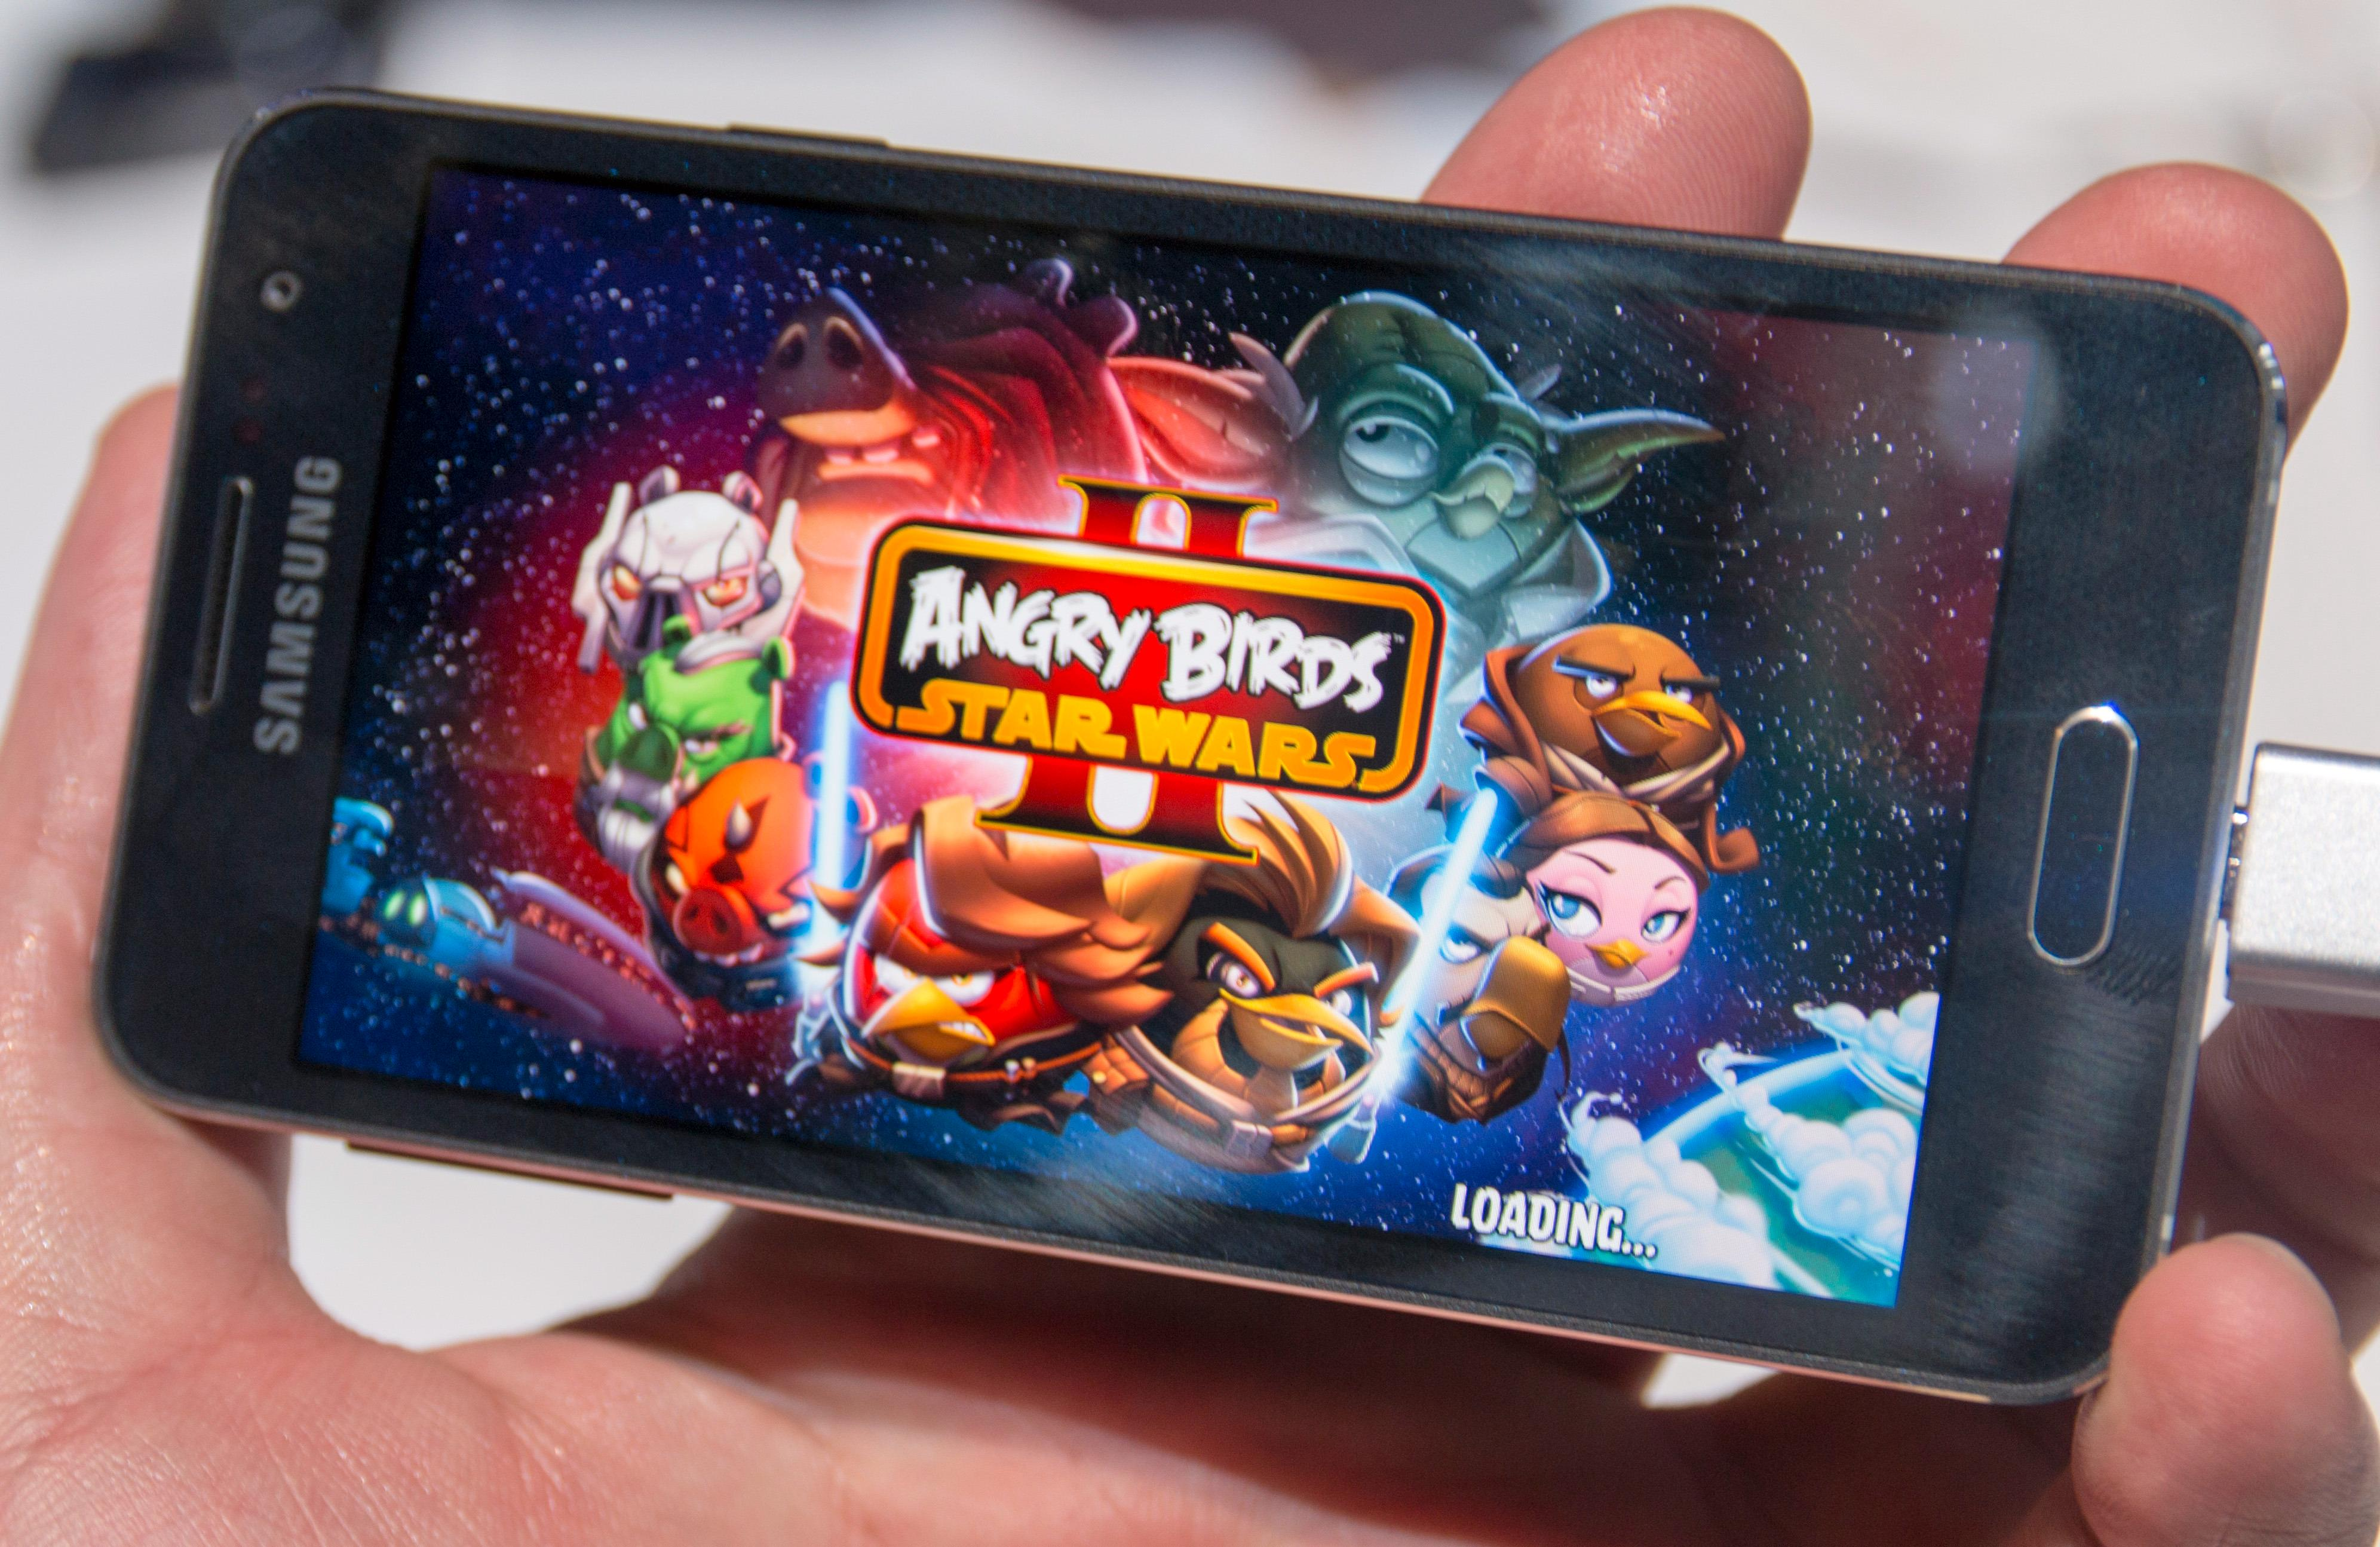 Angry Birds i Star Wars-utgave følger med på telefonene. Foto: Finn Jarle Kvalheim, Tek.no